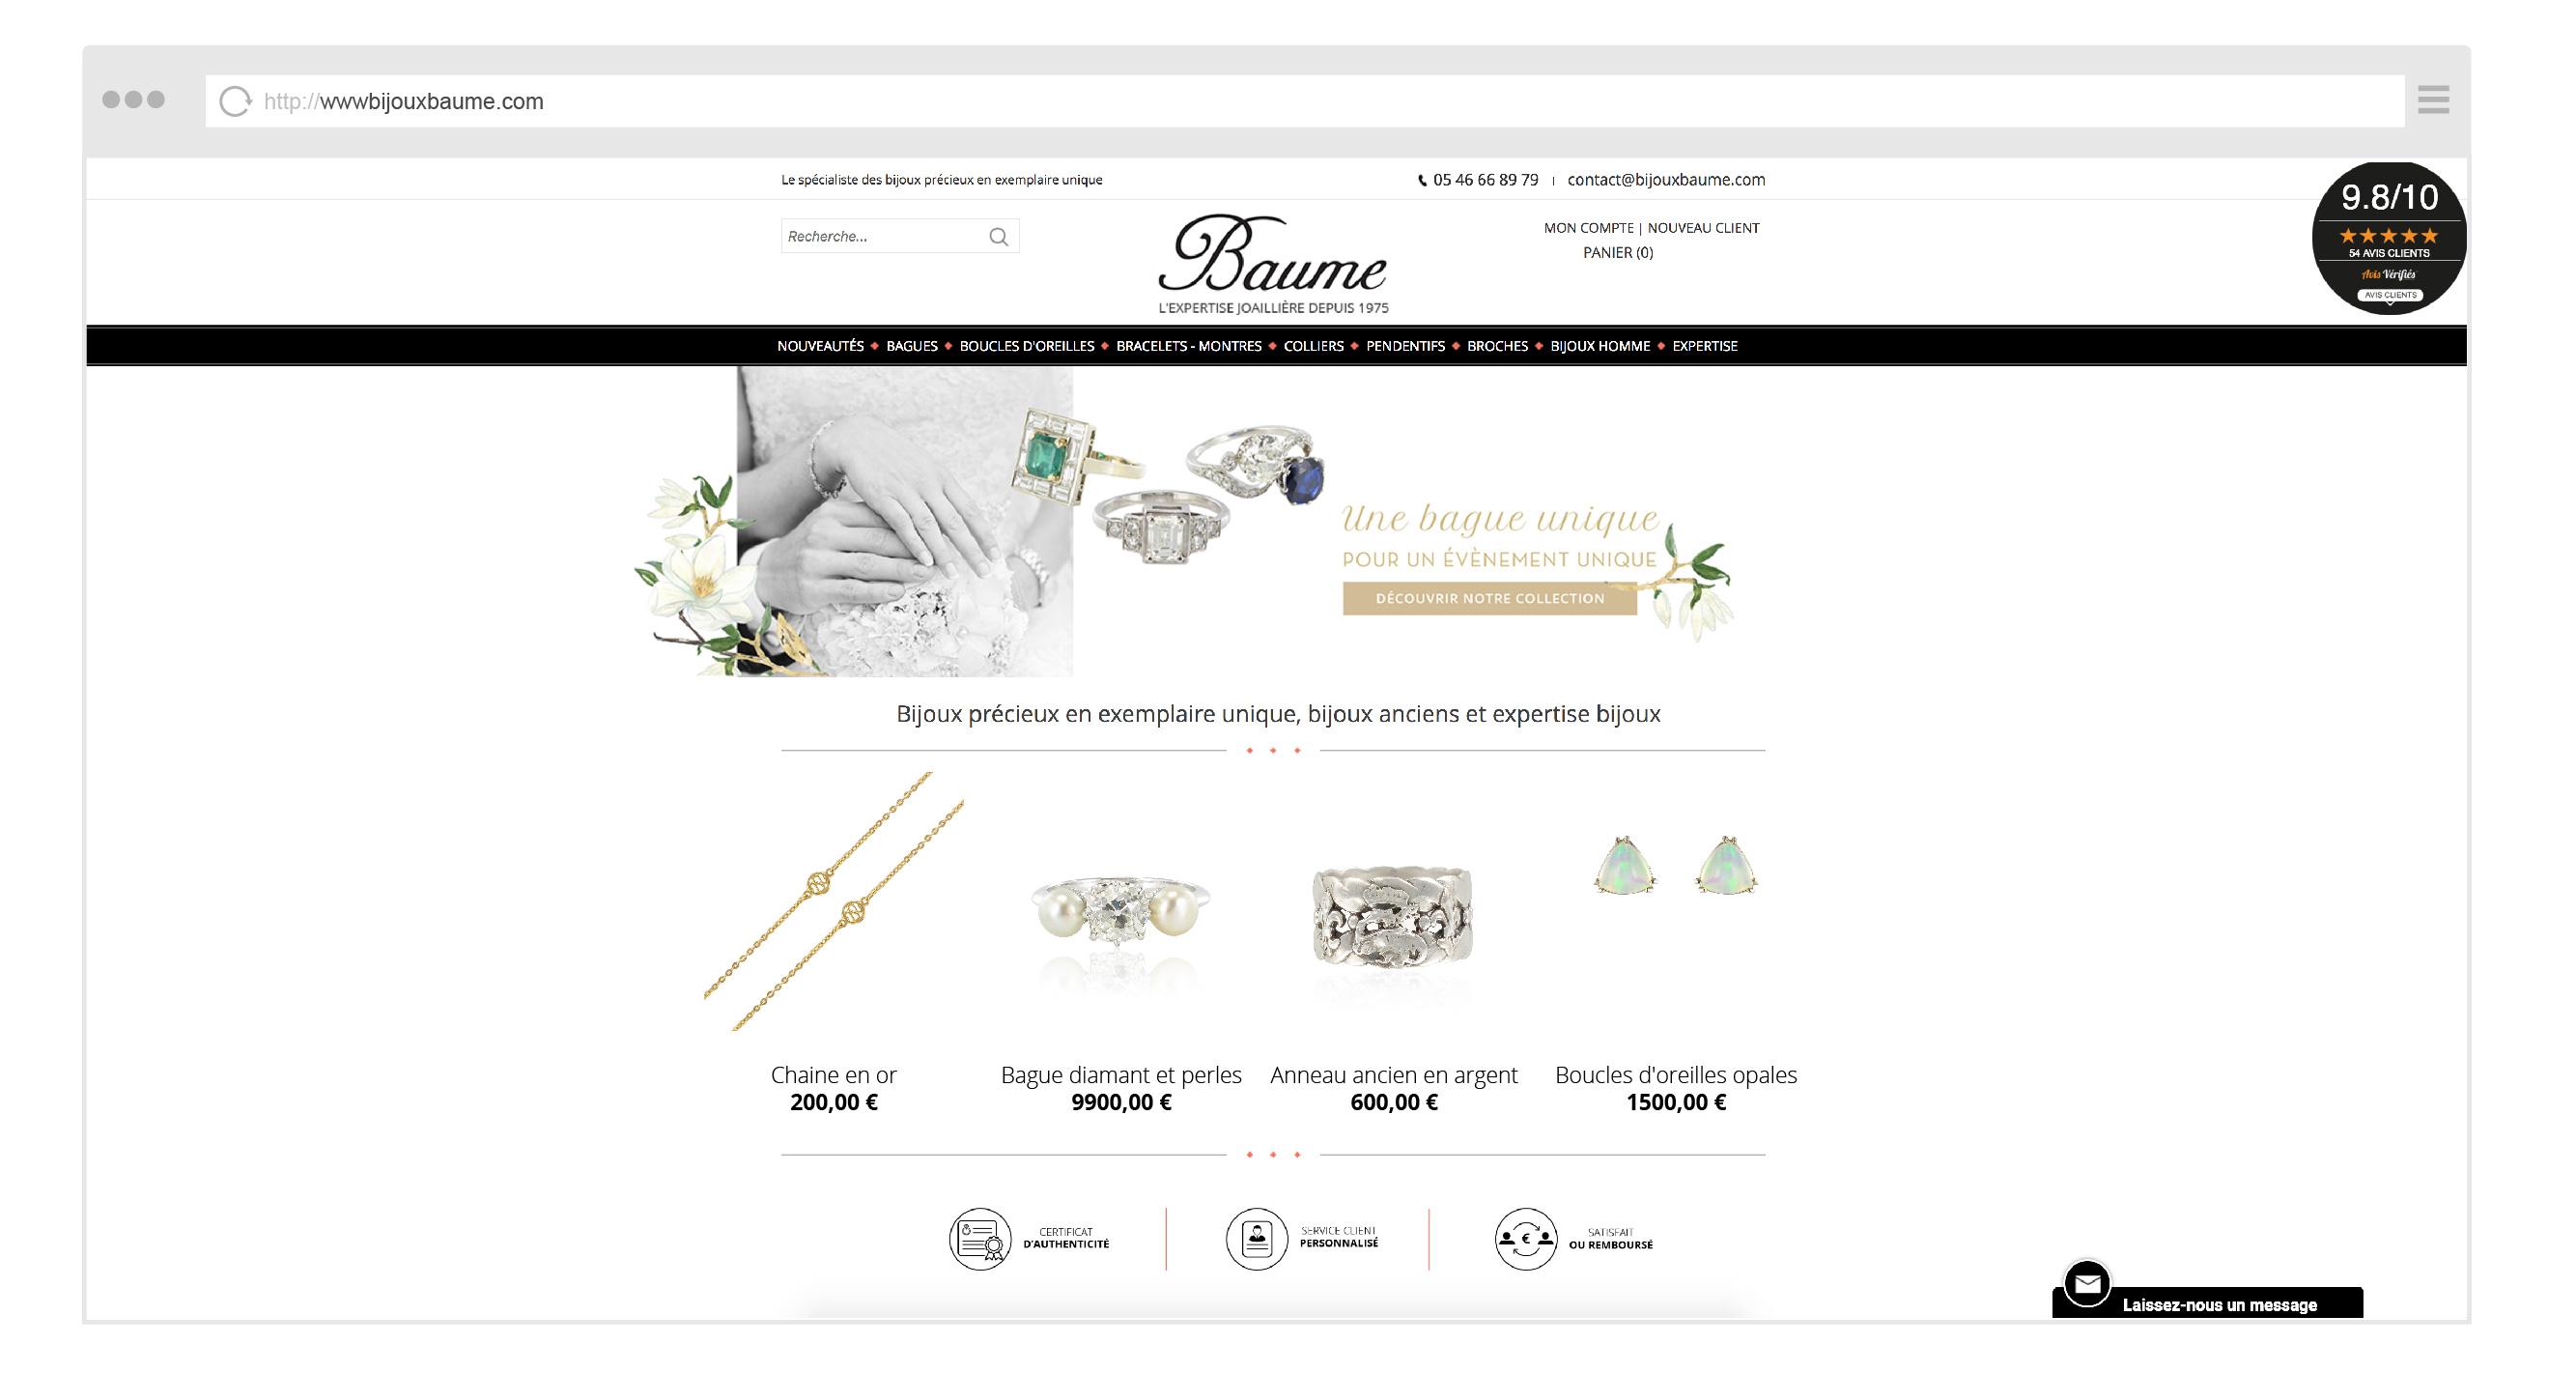 mariebabeau-graphiste-photographe-freelance-strasbourg-bijoux baume-photographie-bijoux-produit-web-banniere